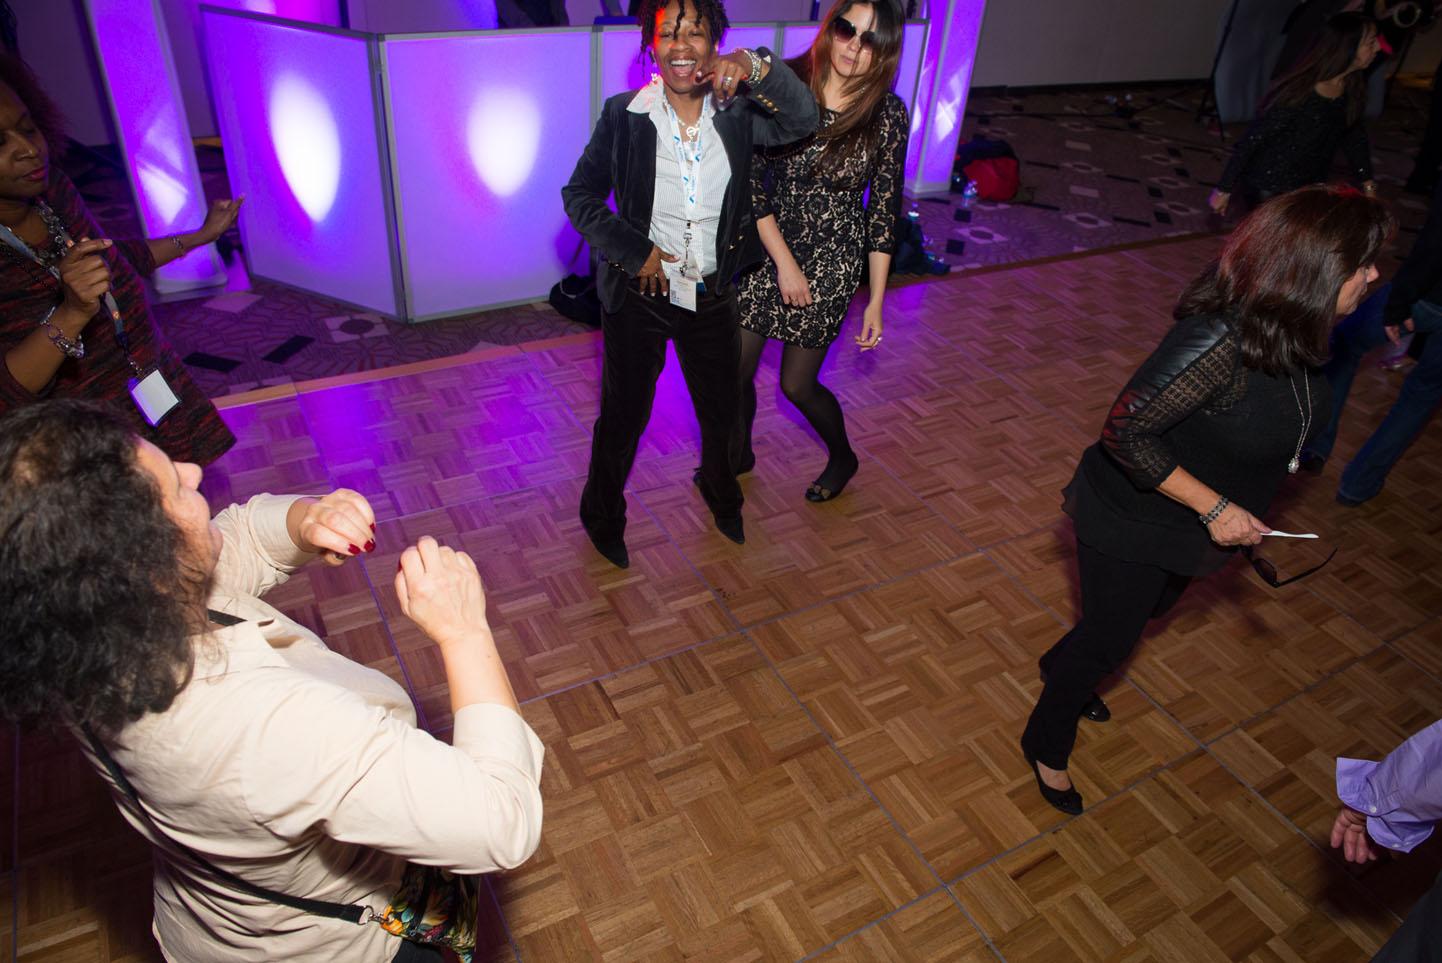 2015-12-09 ReMax Corpoarte Event - The Borgata - Atlantic City NJ - Photo Sesh - 2015-5227.jpg